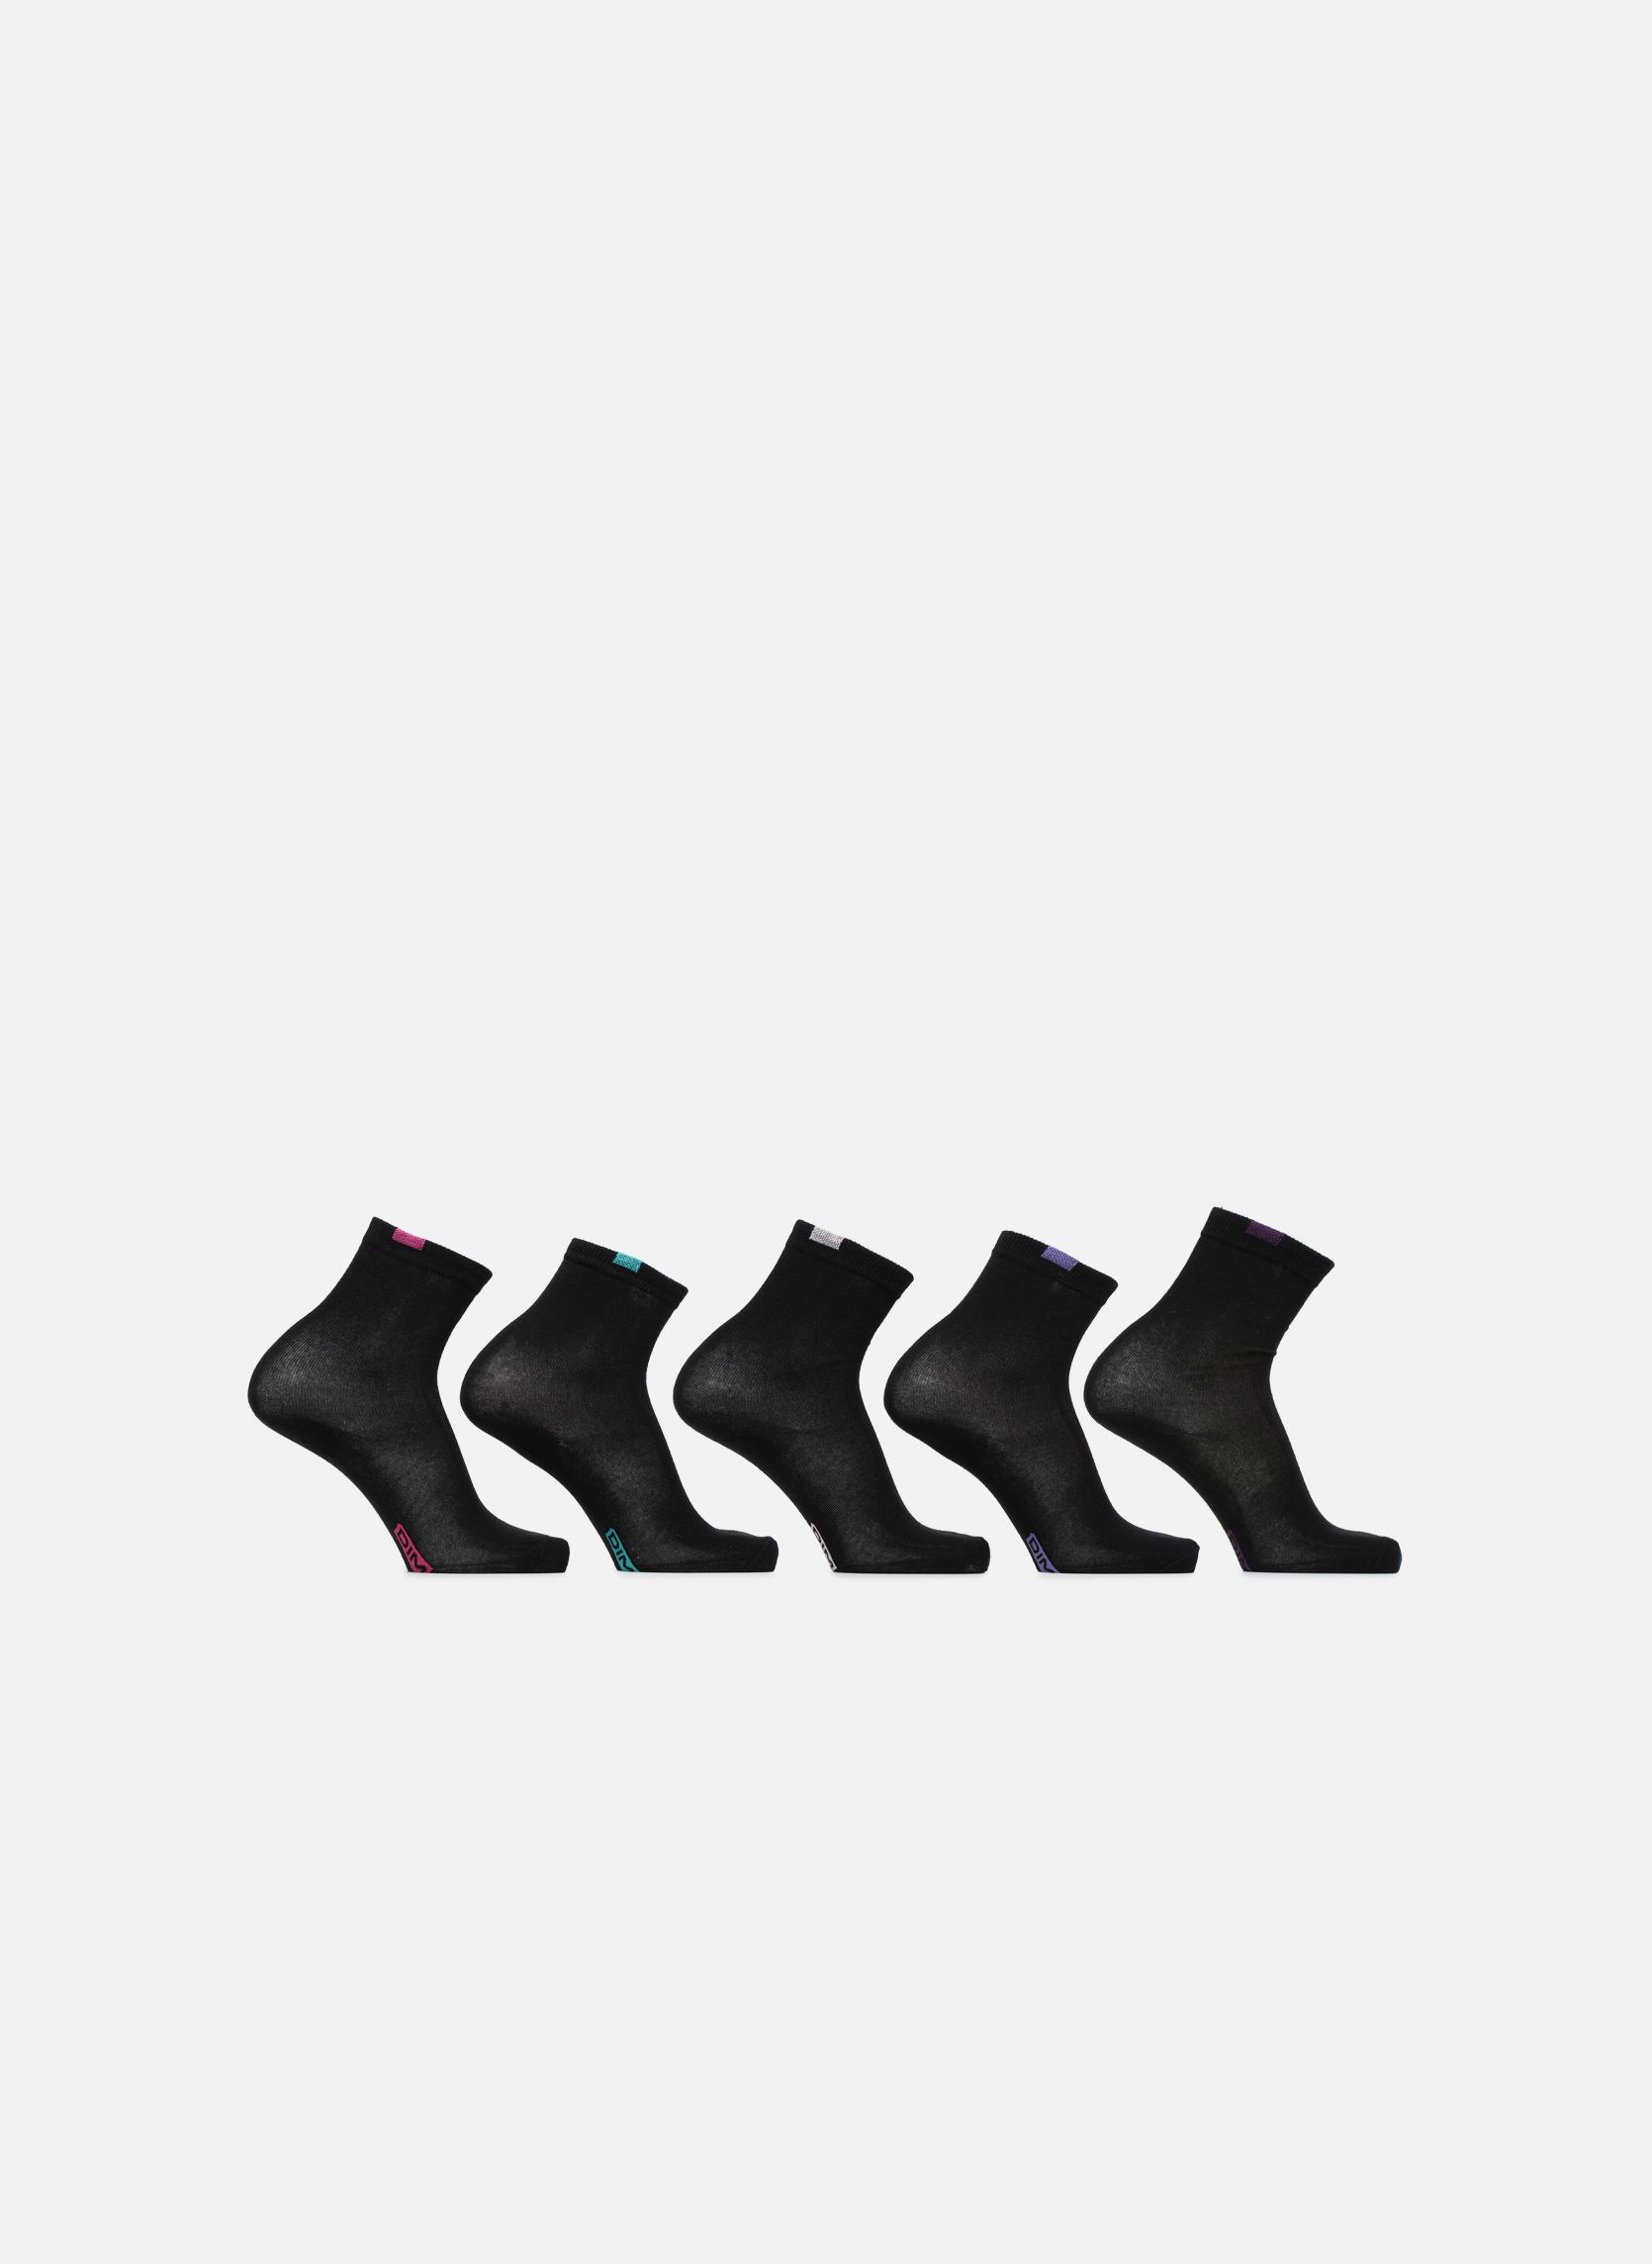 M-chaussettes ECODIM X5 Femme